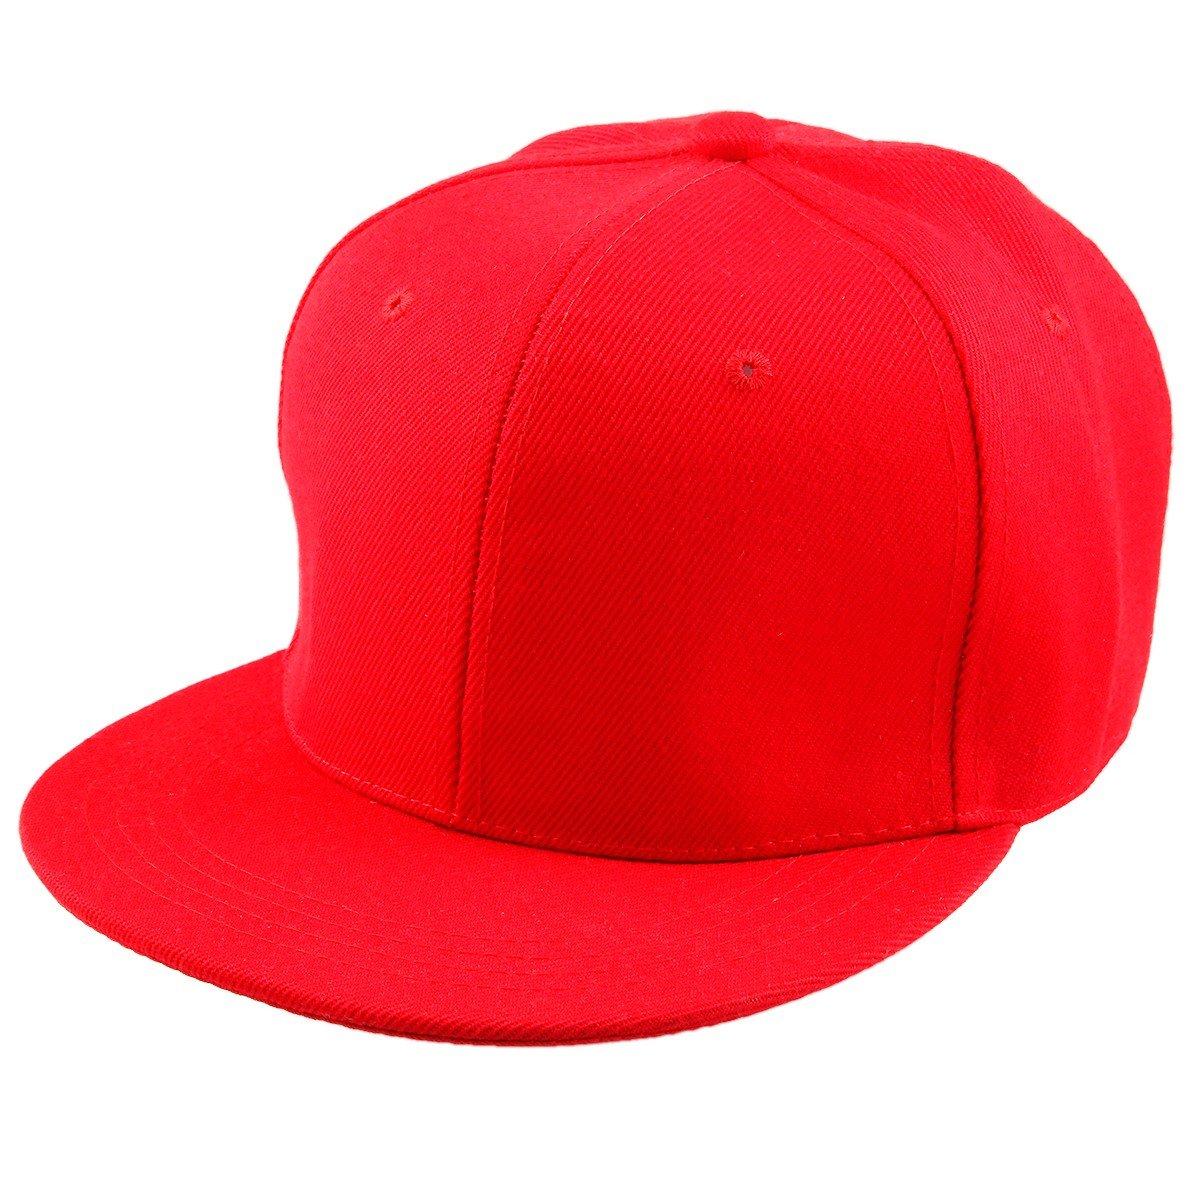 Samtree Women Men Snapback Hats ad311a473ff